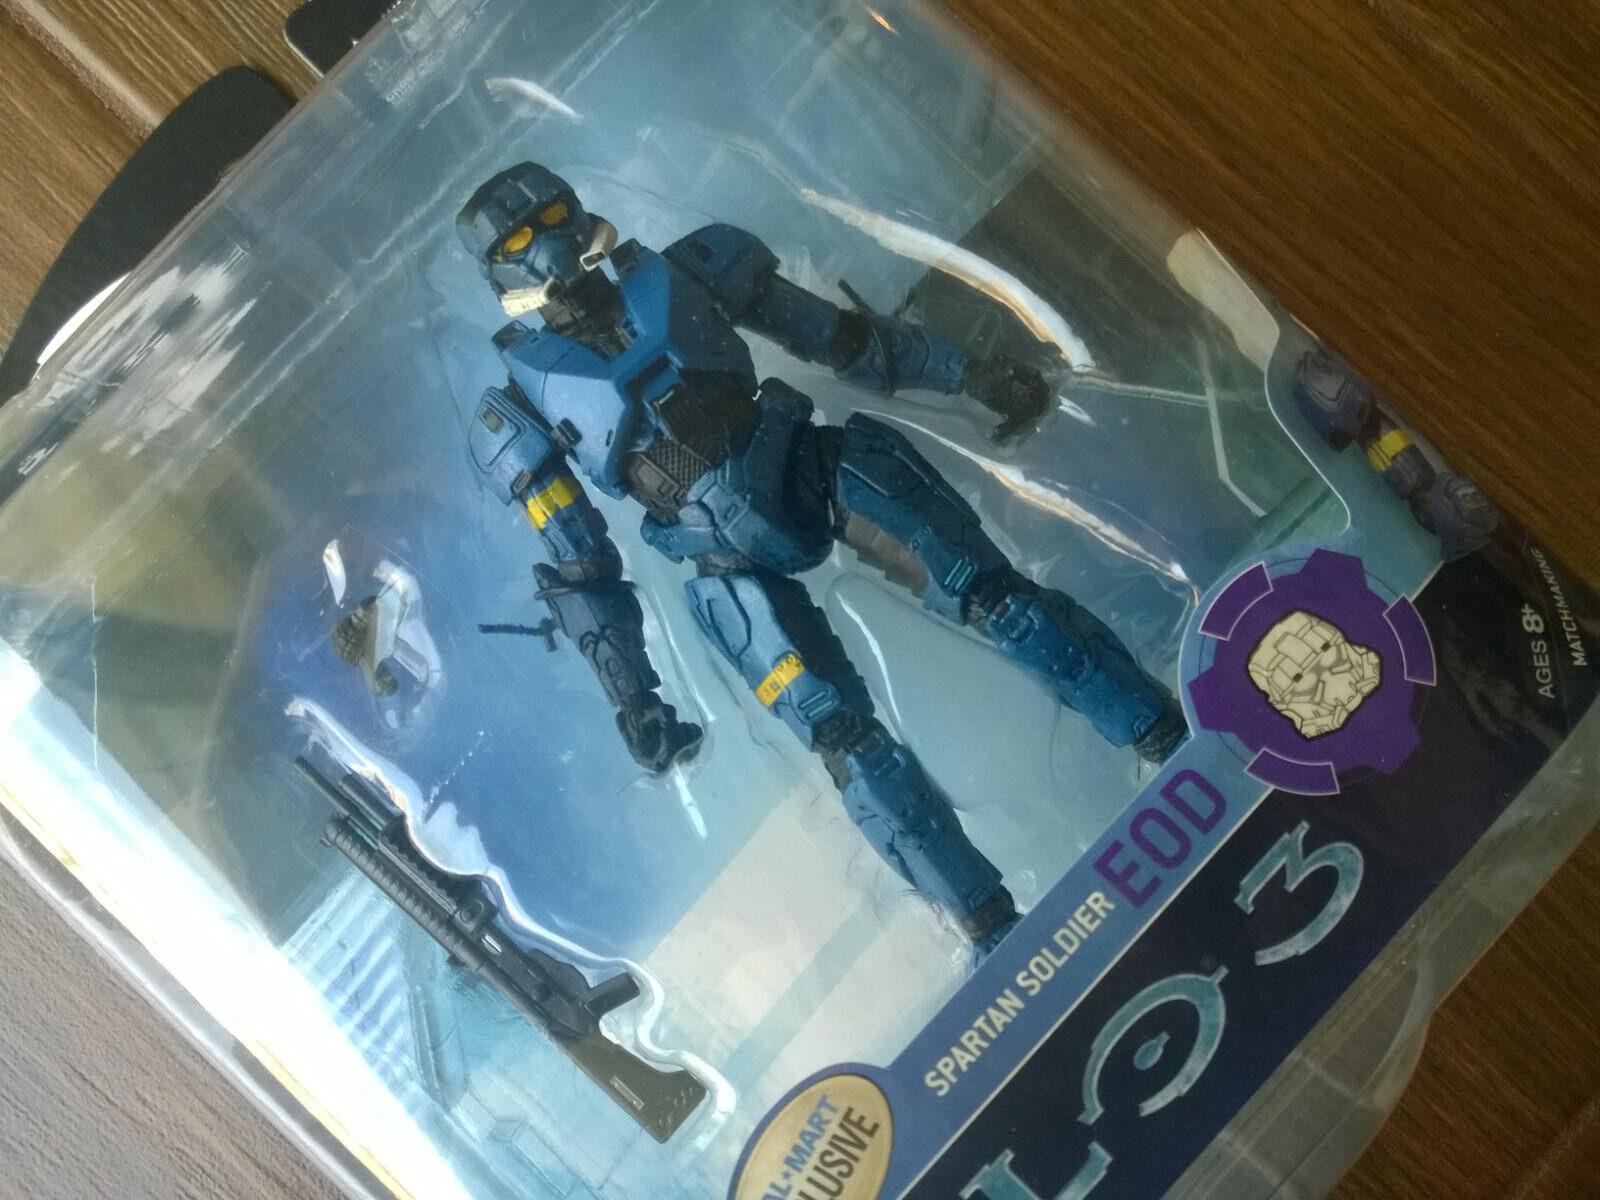 WalMart exclusive Halo 3 Series 2